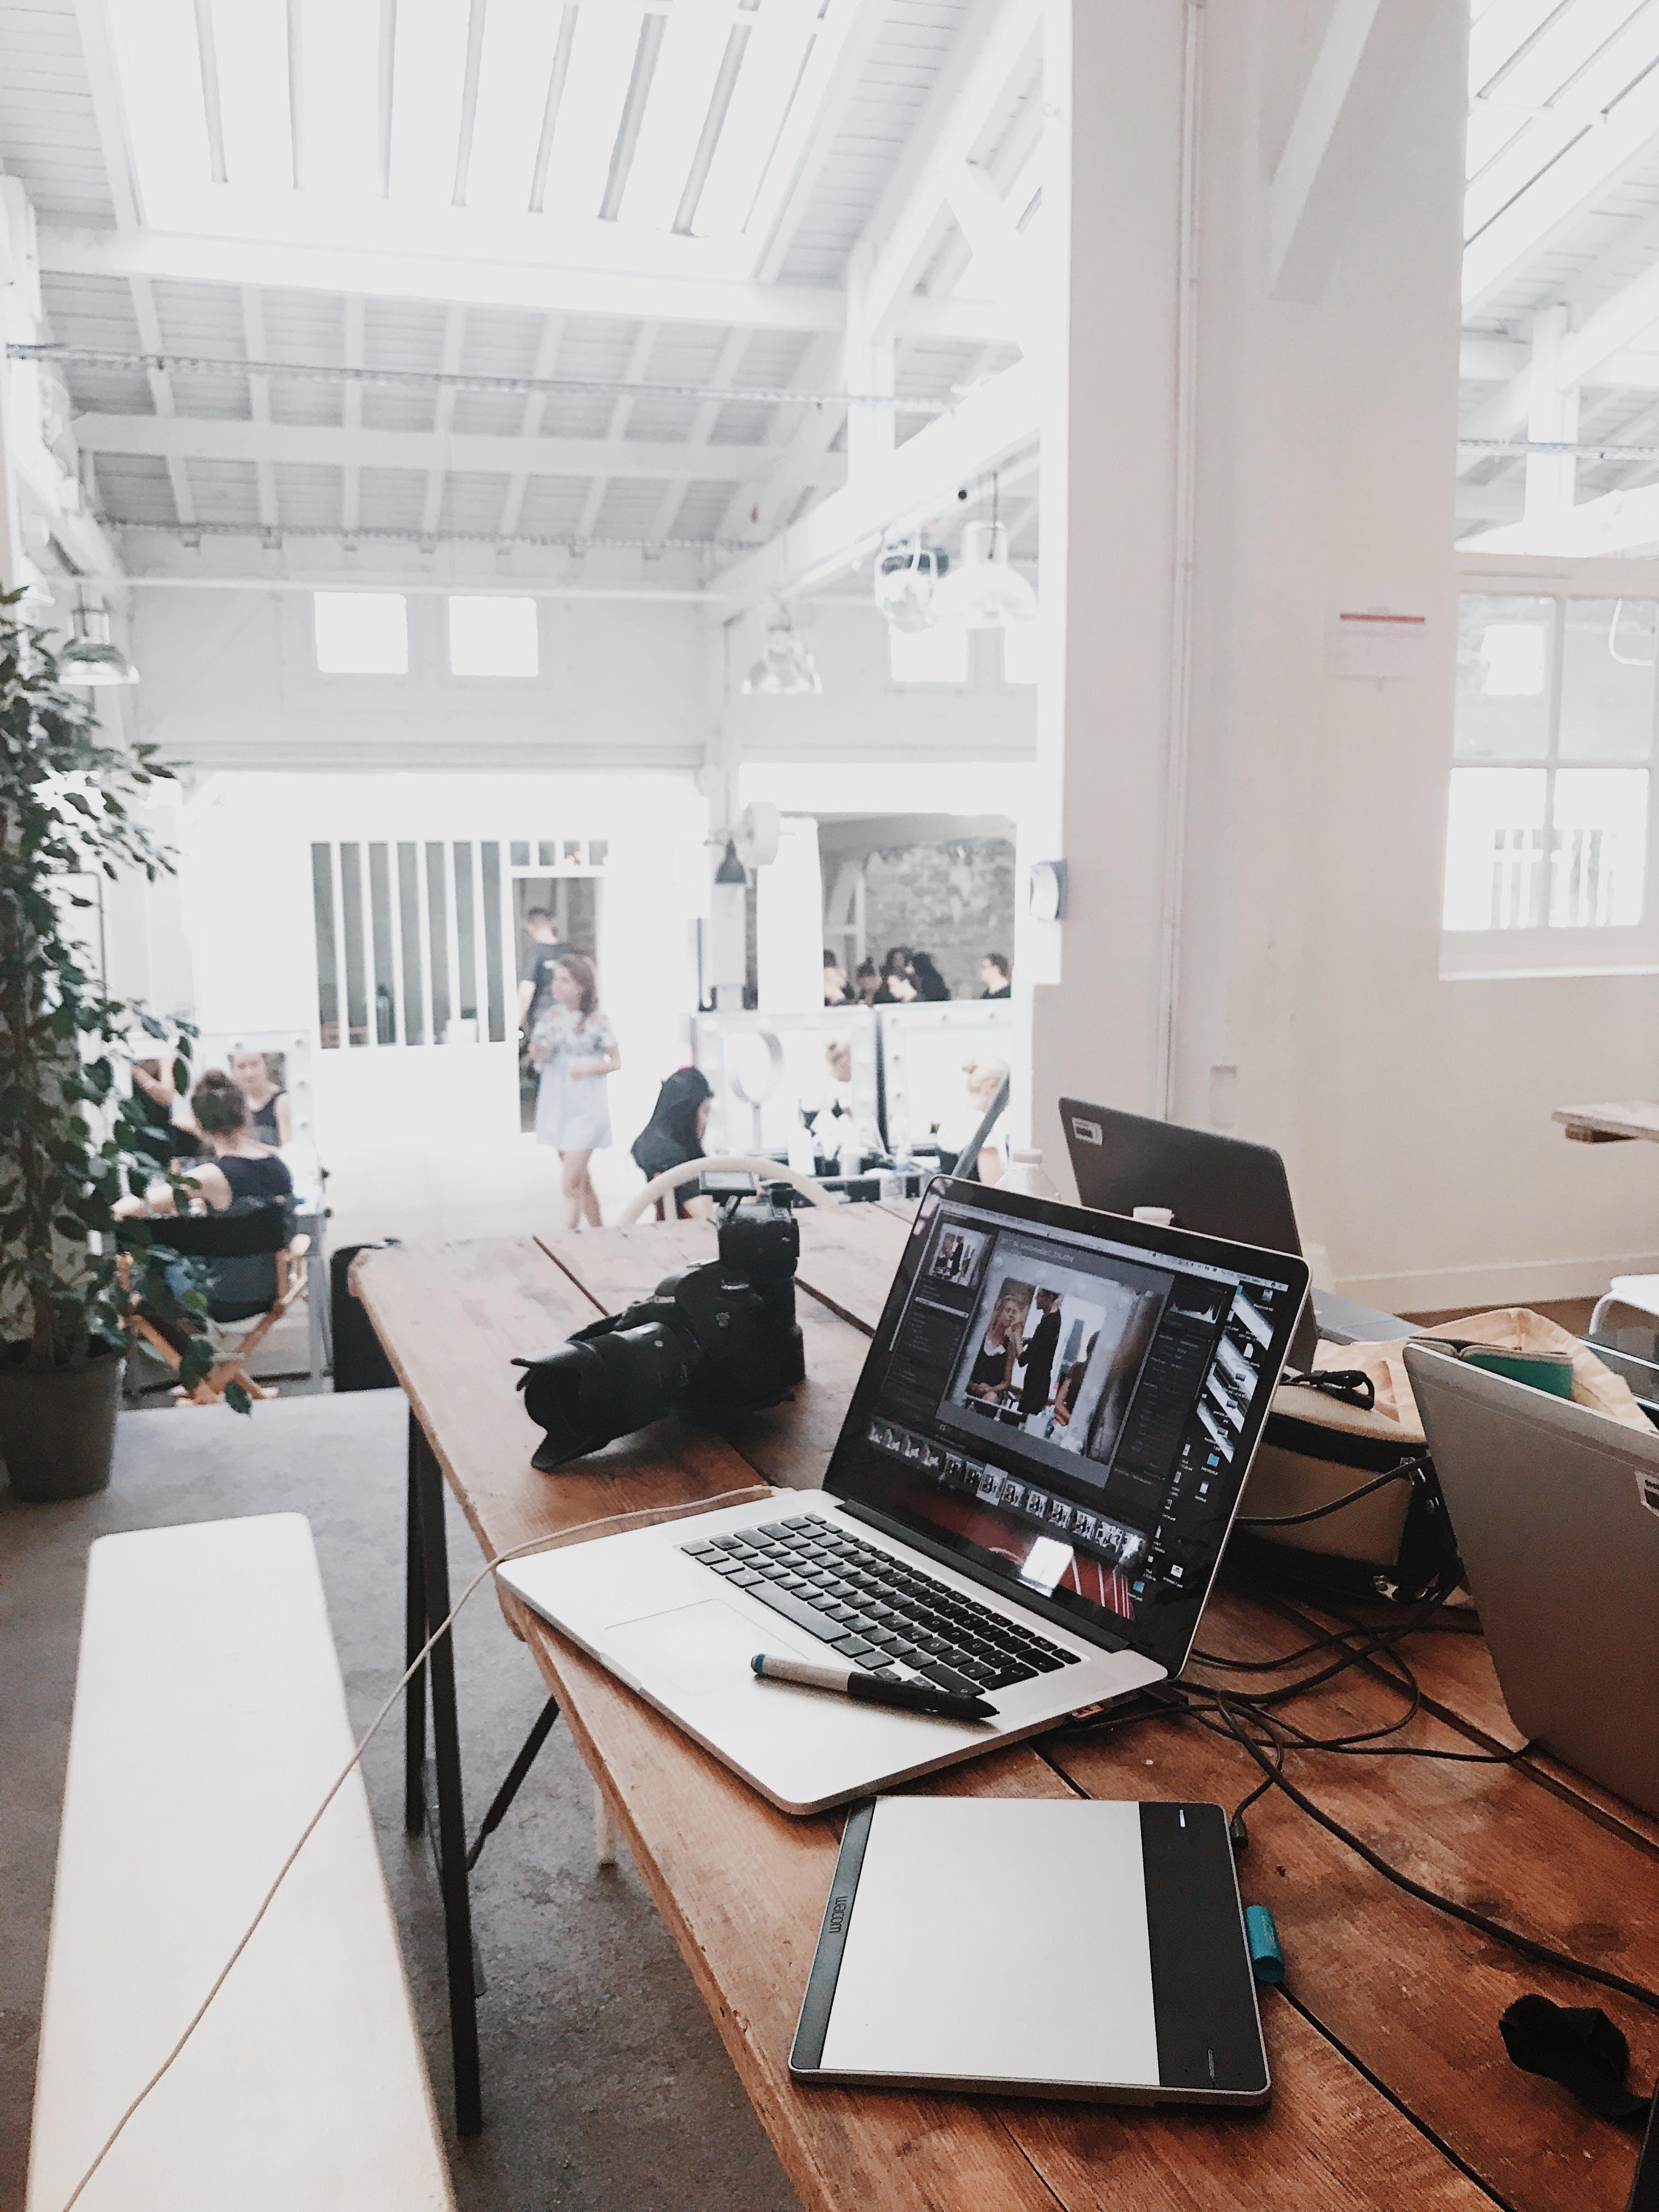 arbeitsplatz, büro, business